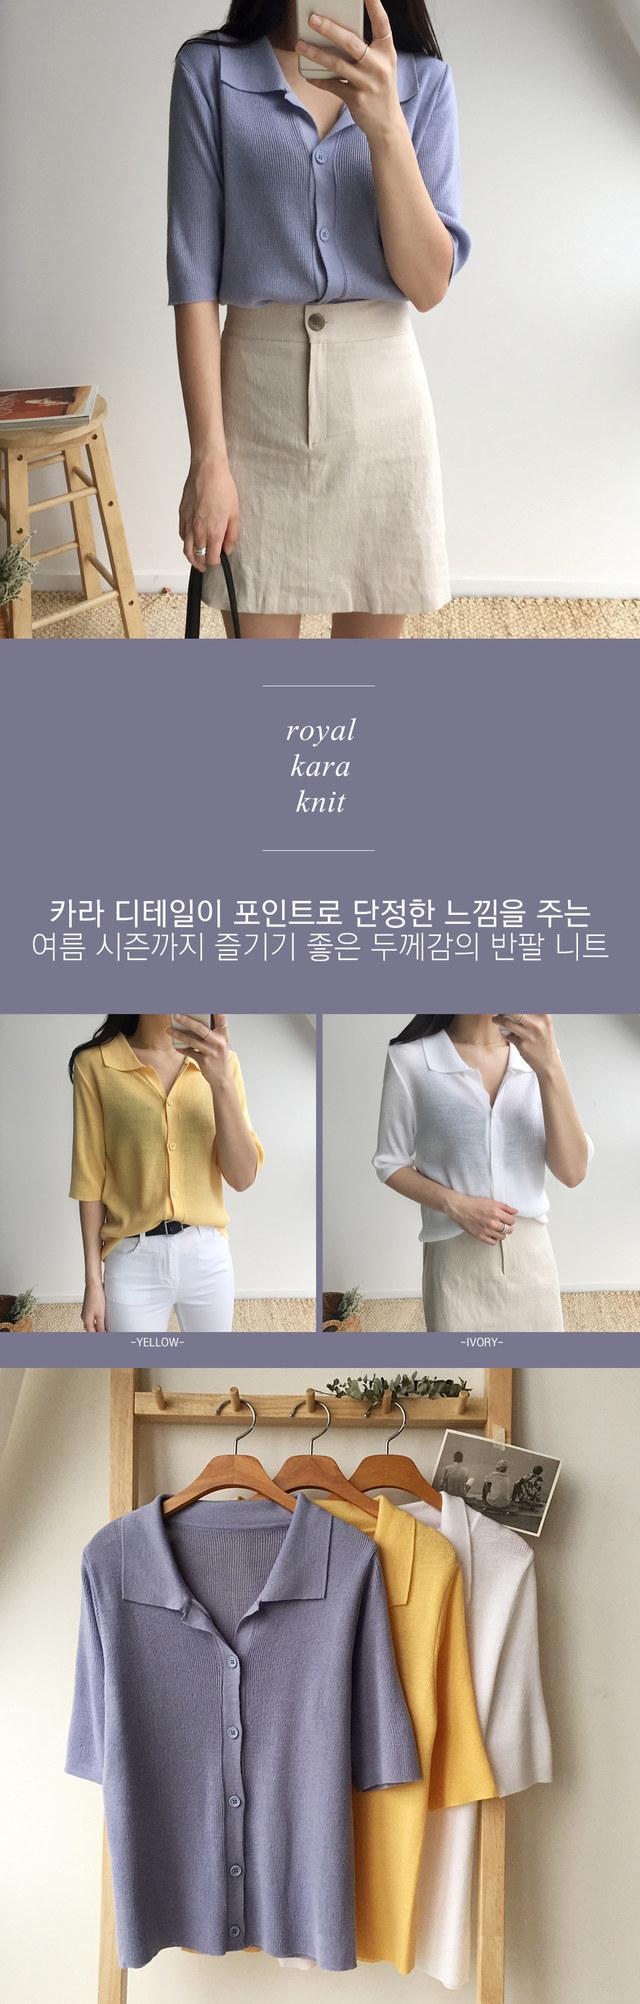 Royal Karanit